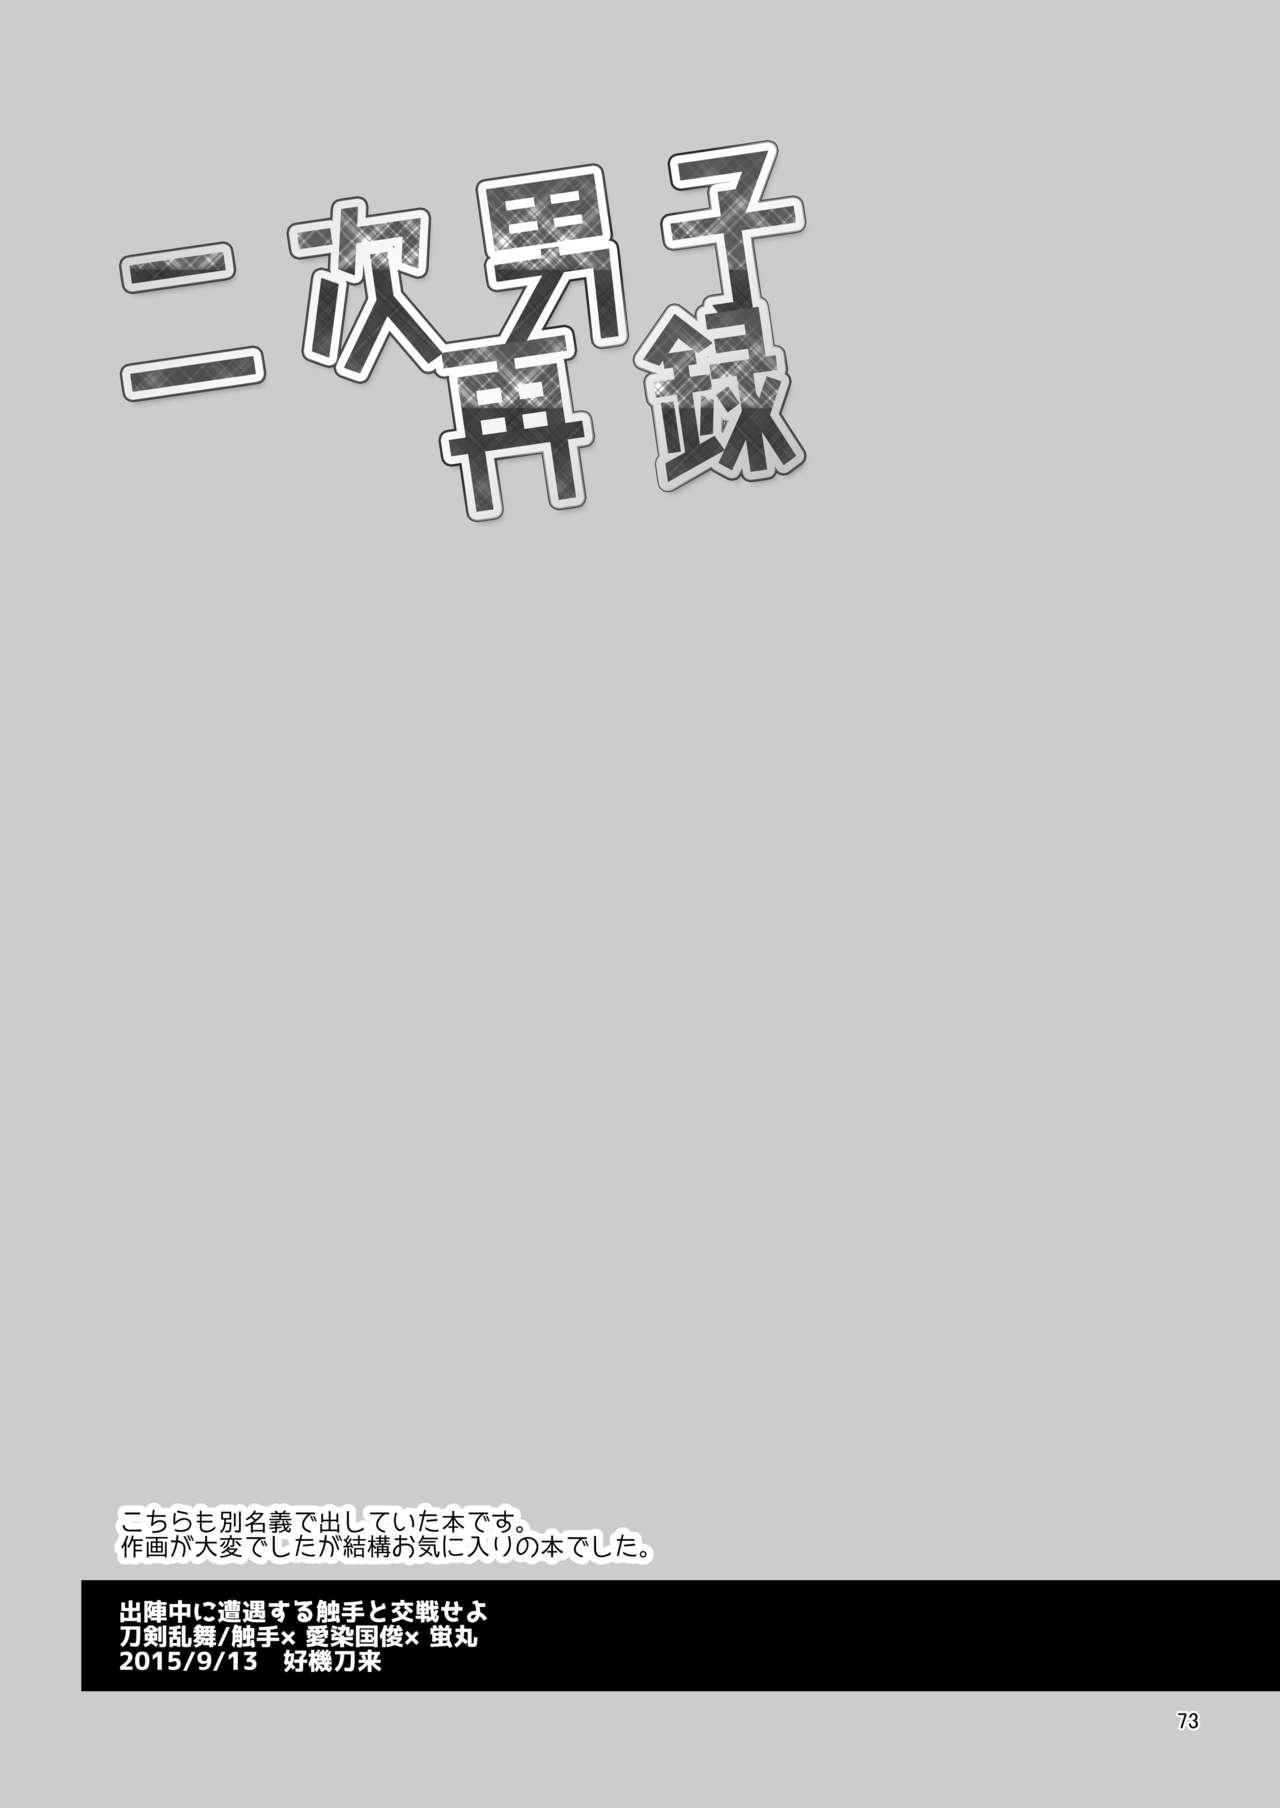 Niji Danshi Rerelease 73